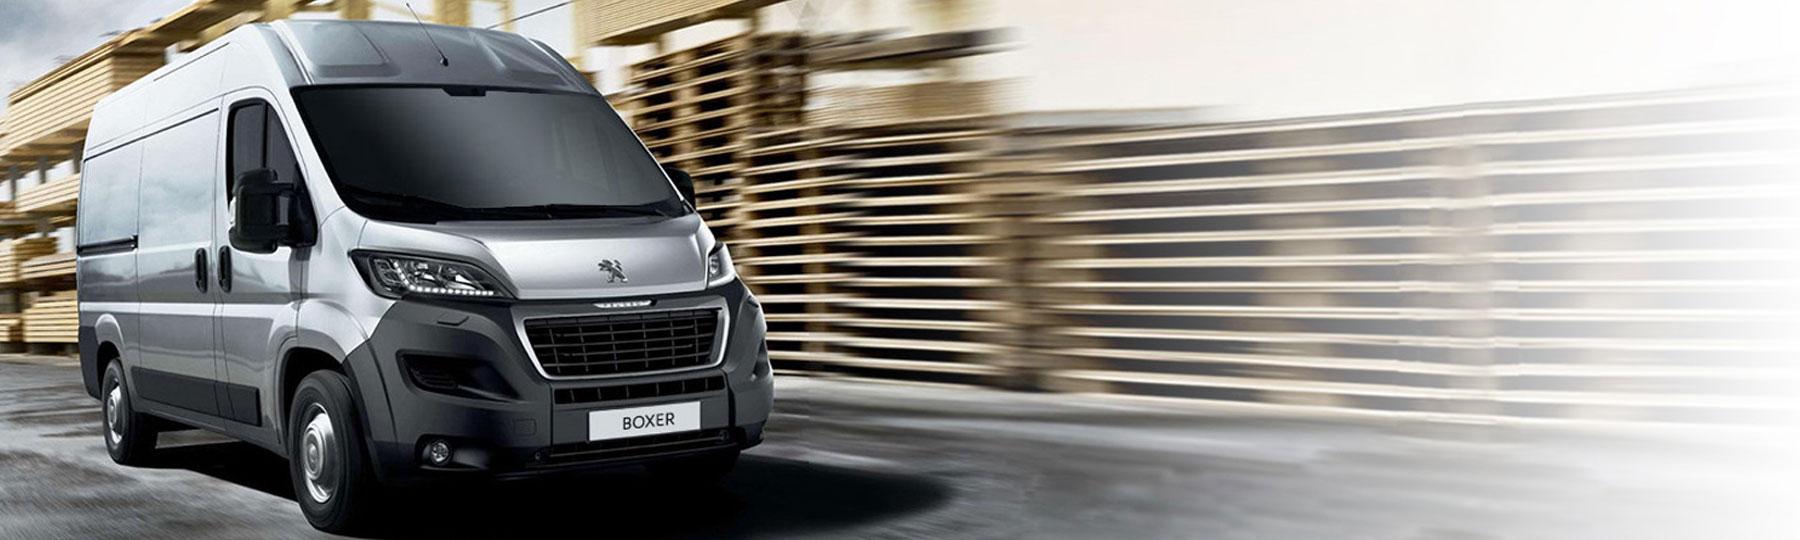 New Peugeot Boxer